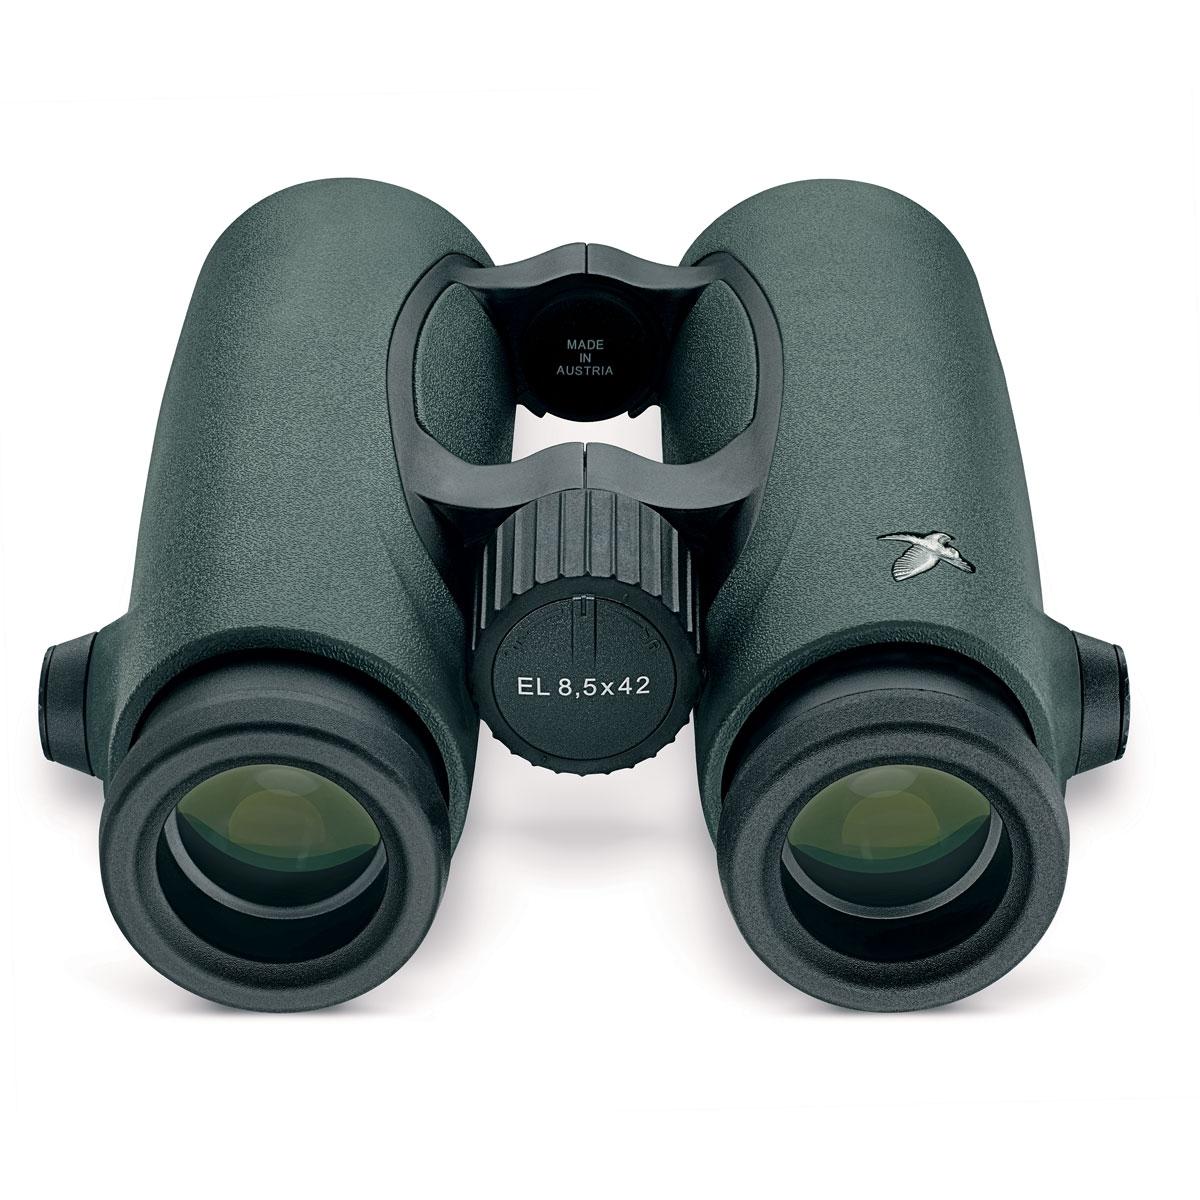 Design; Swarovski Ccsp Comfort Carrying Strap Pro For Field Pro Binoculars Novel In